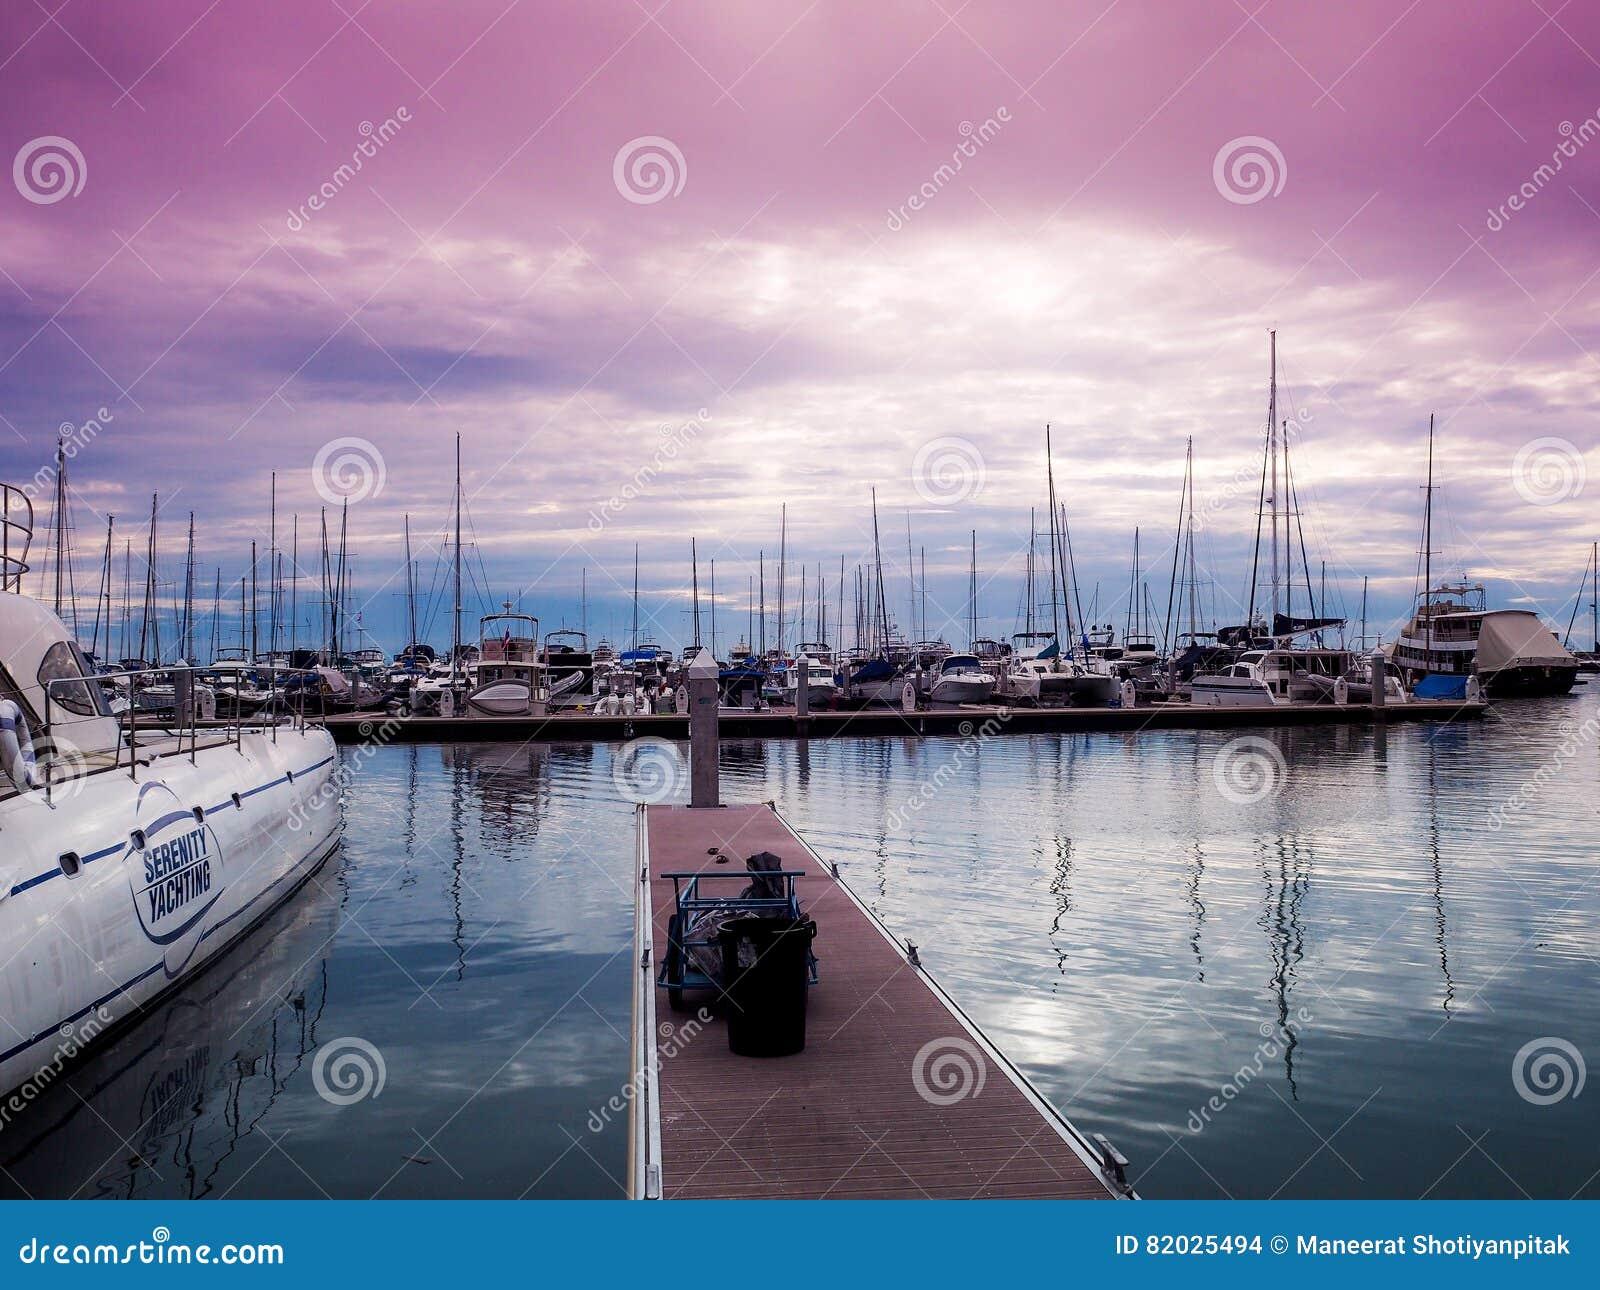 The sailing boats in Marina yacht club Pattaya